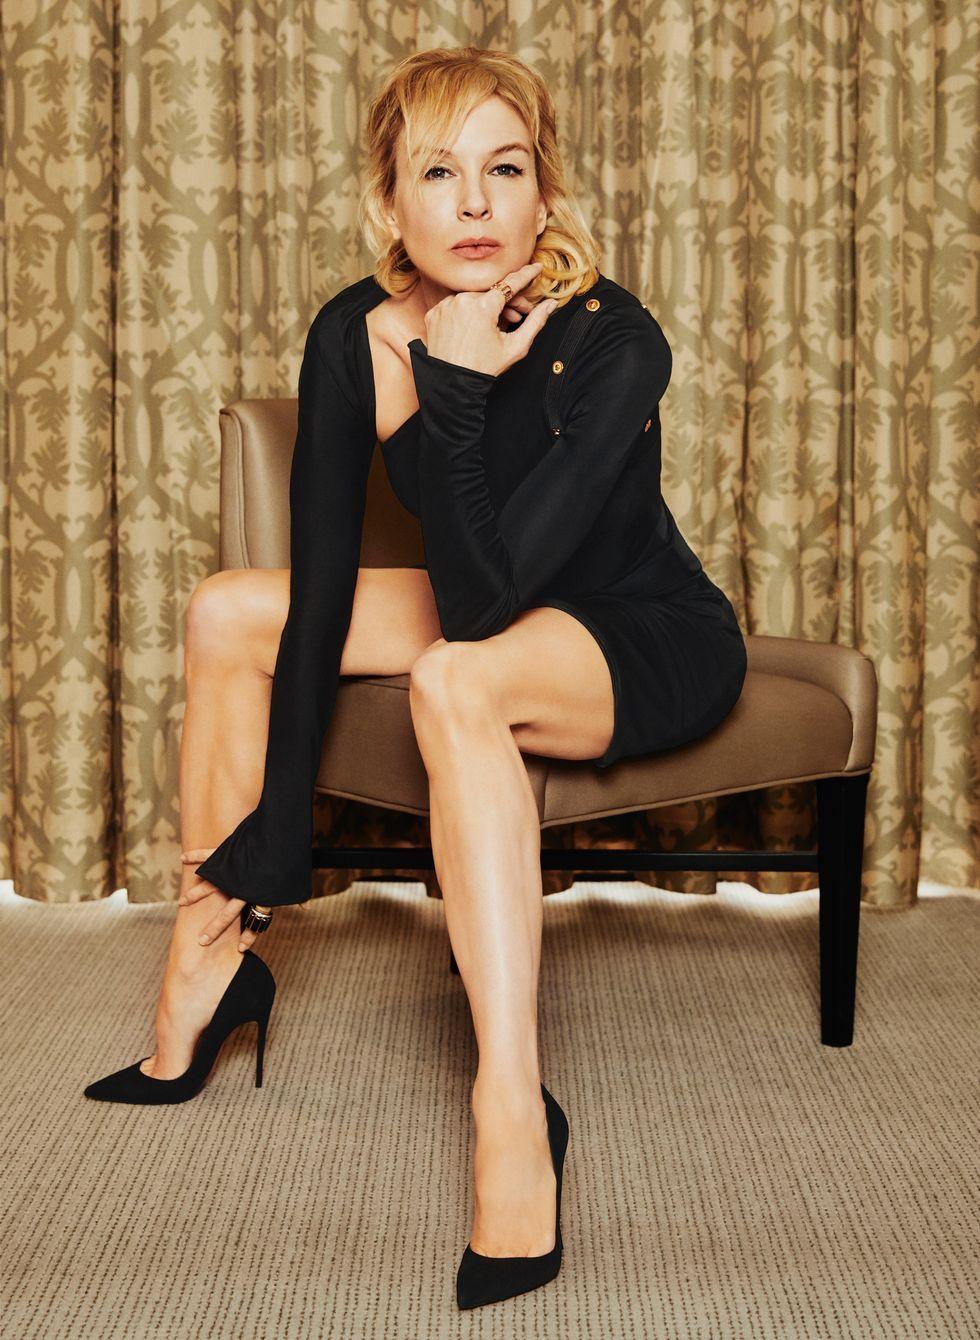 Renée Zellweger wears a Versace dress, Christian Louboutin heels, a rose gold Pemallato Brera ring, and her own David Webb scallop ring.